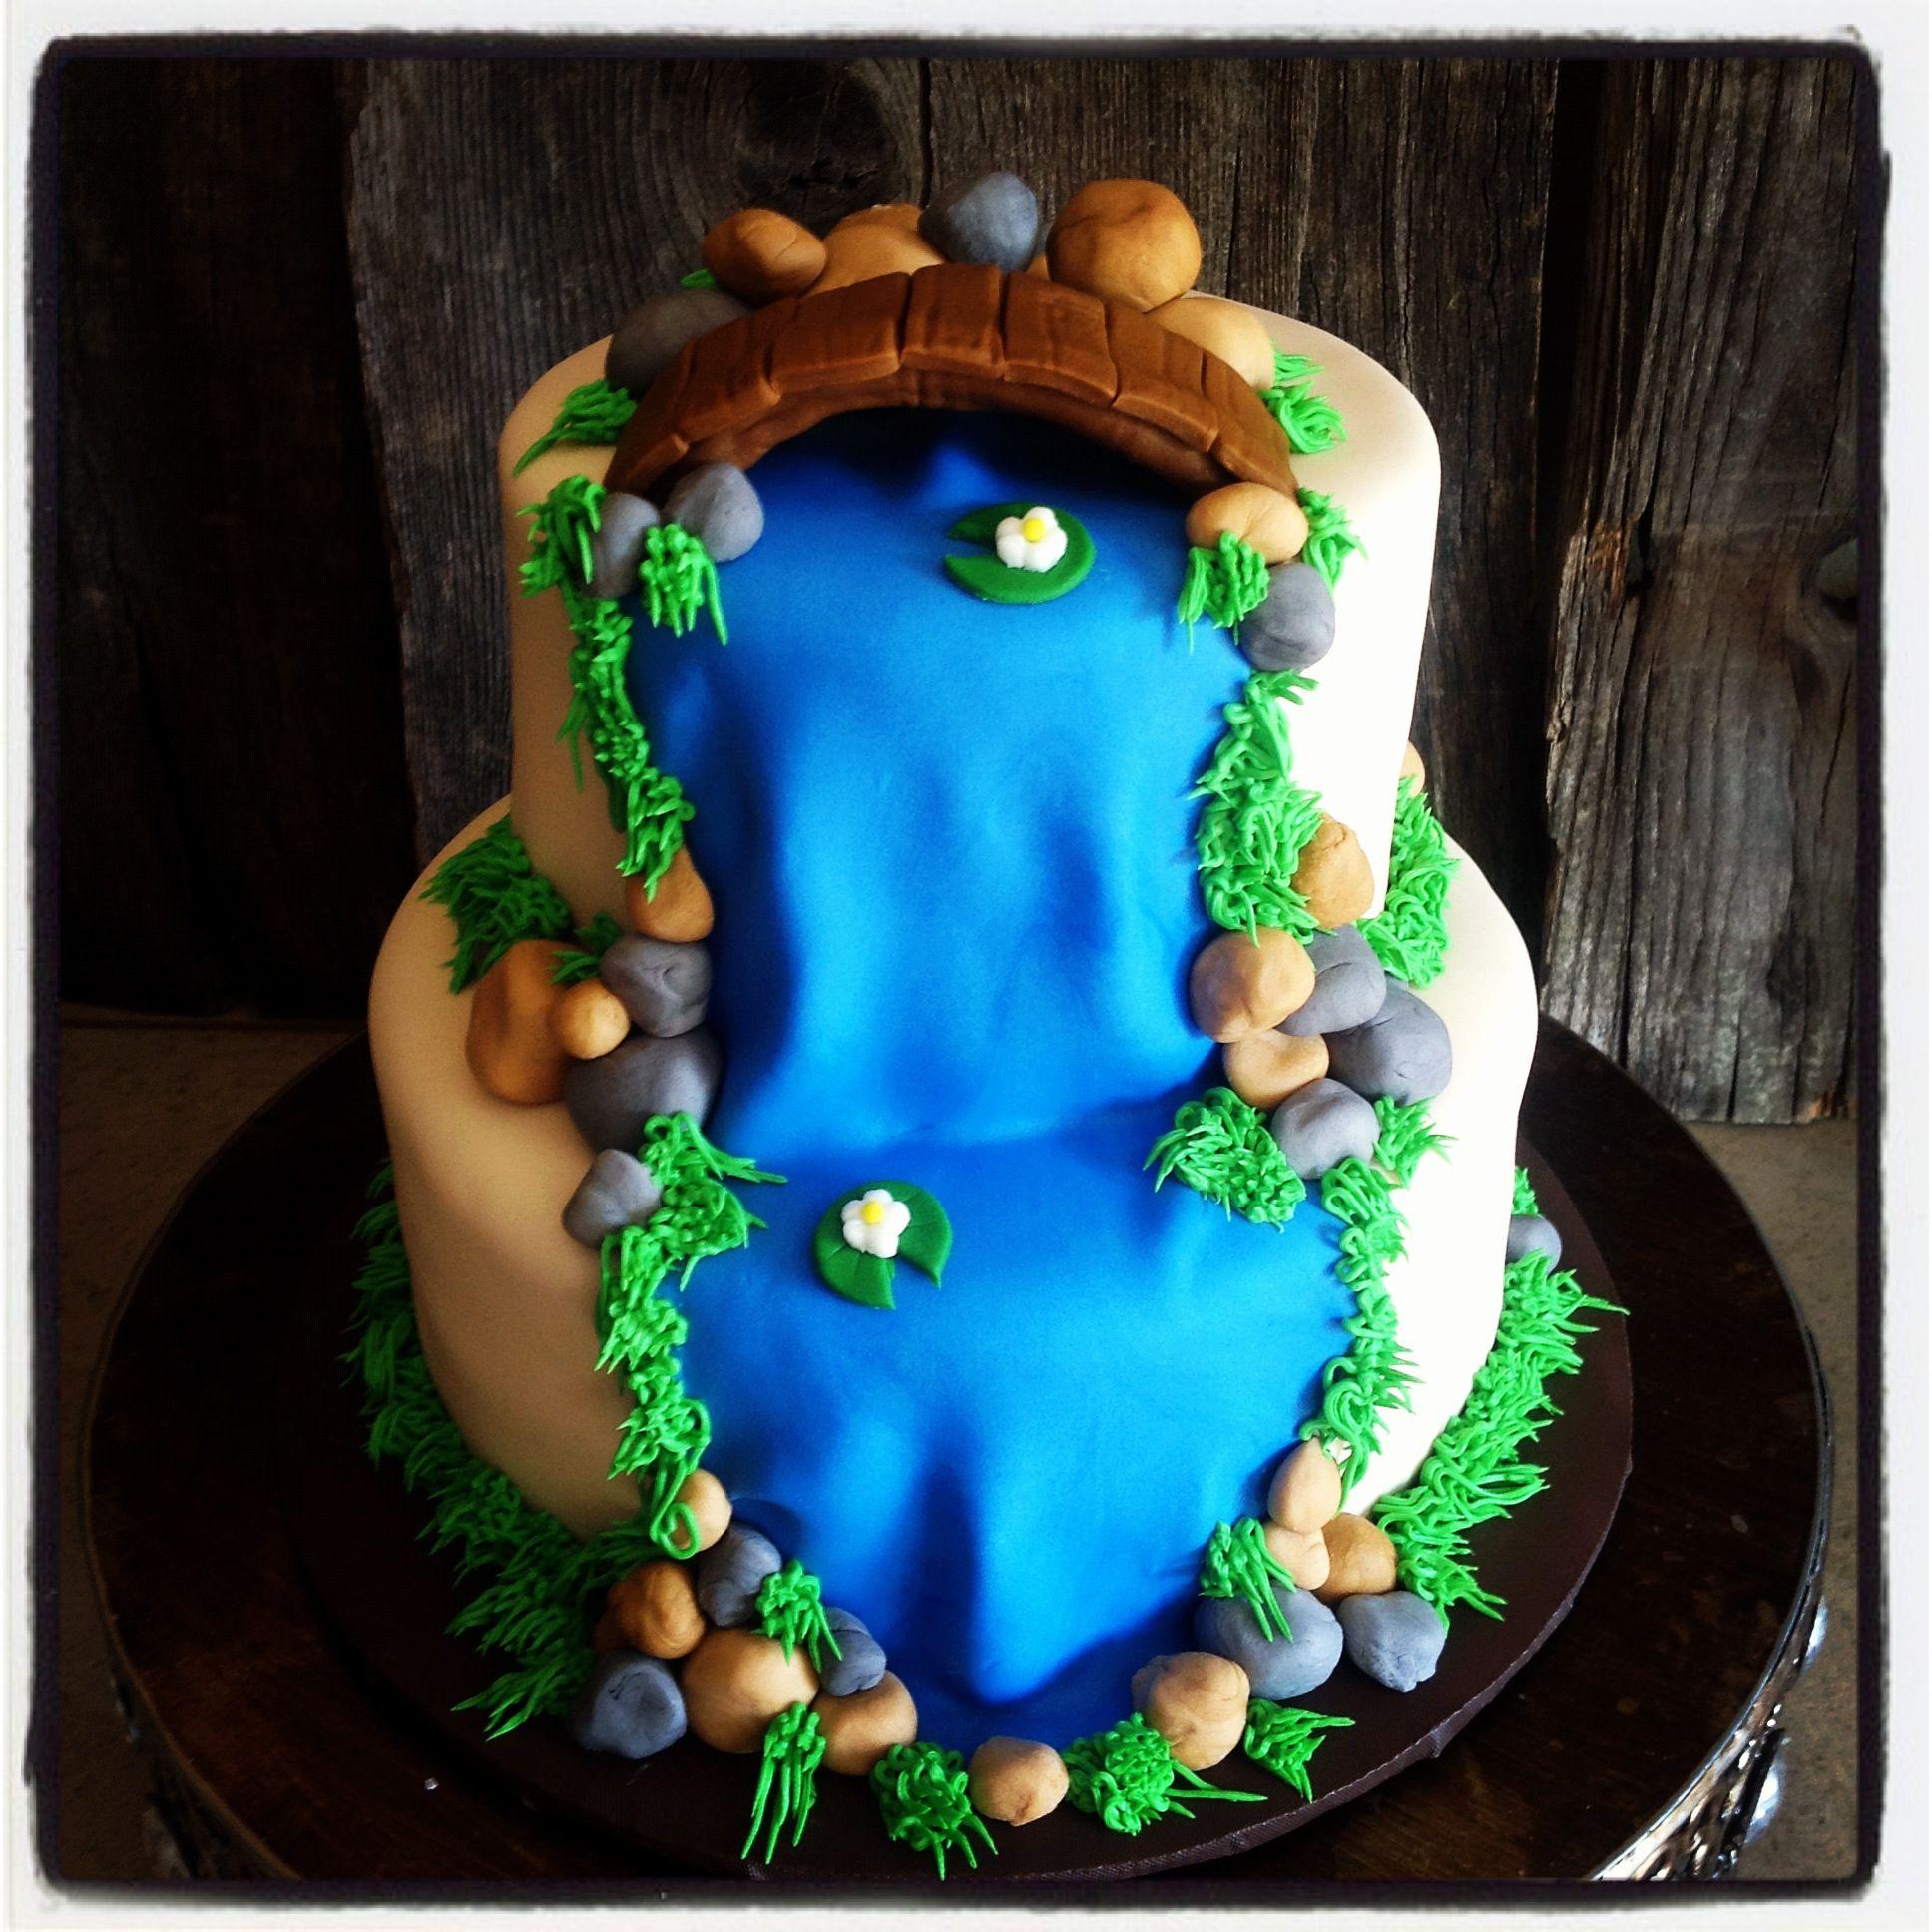 Landscape cake | Garden cakes, Earth cake, Cake decorating